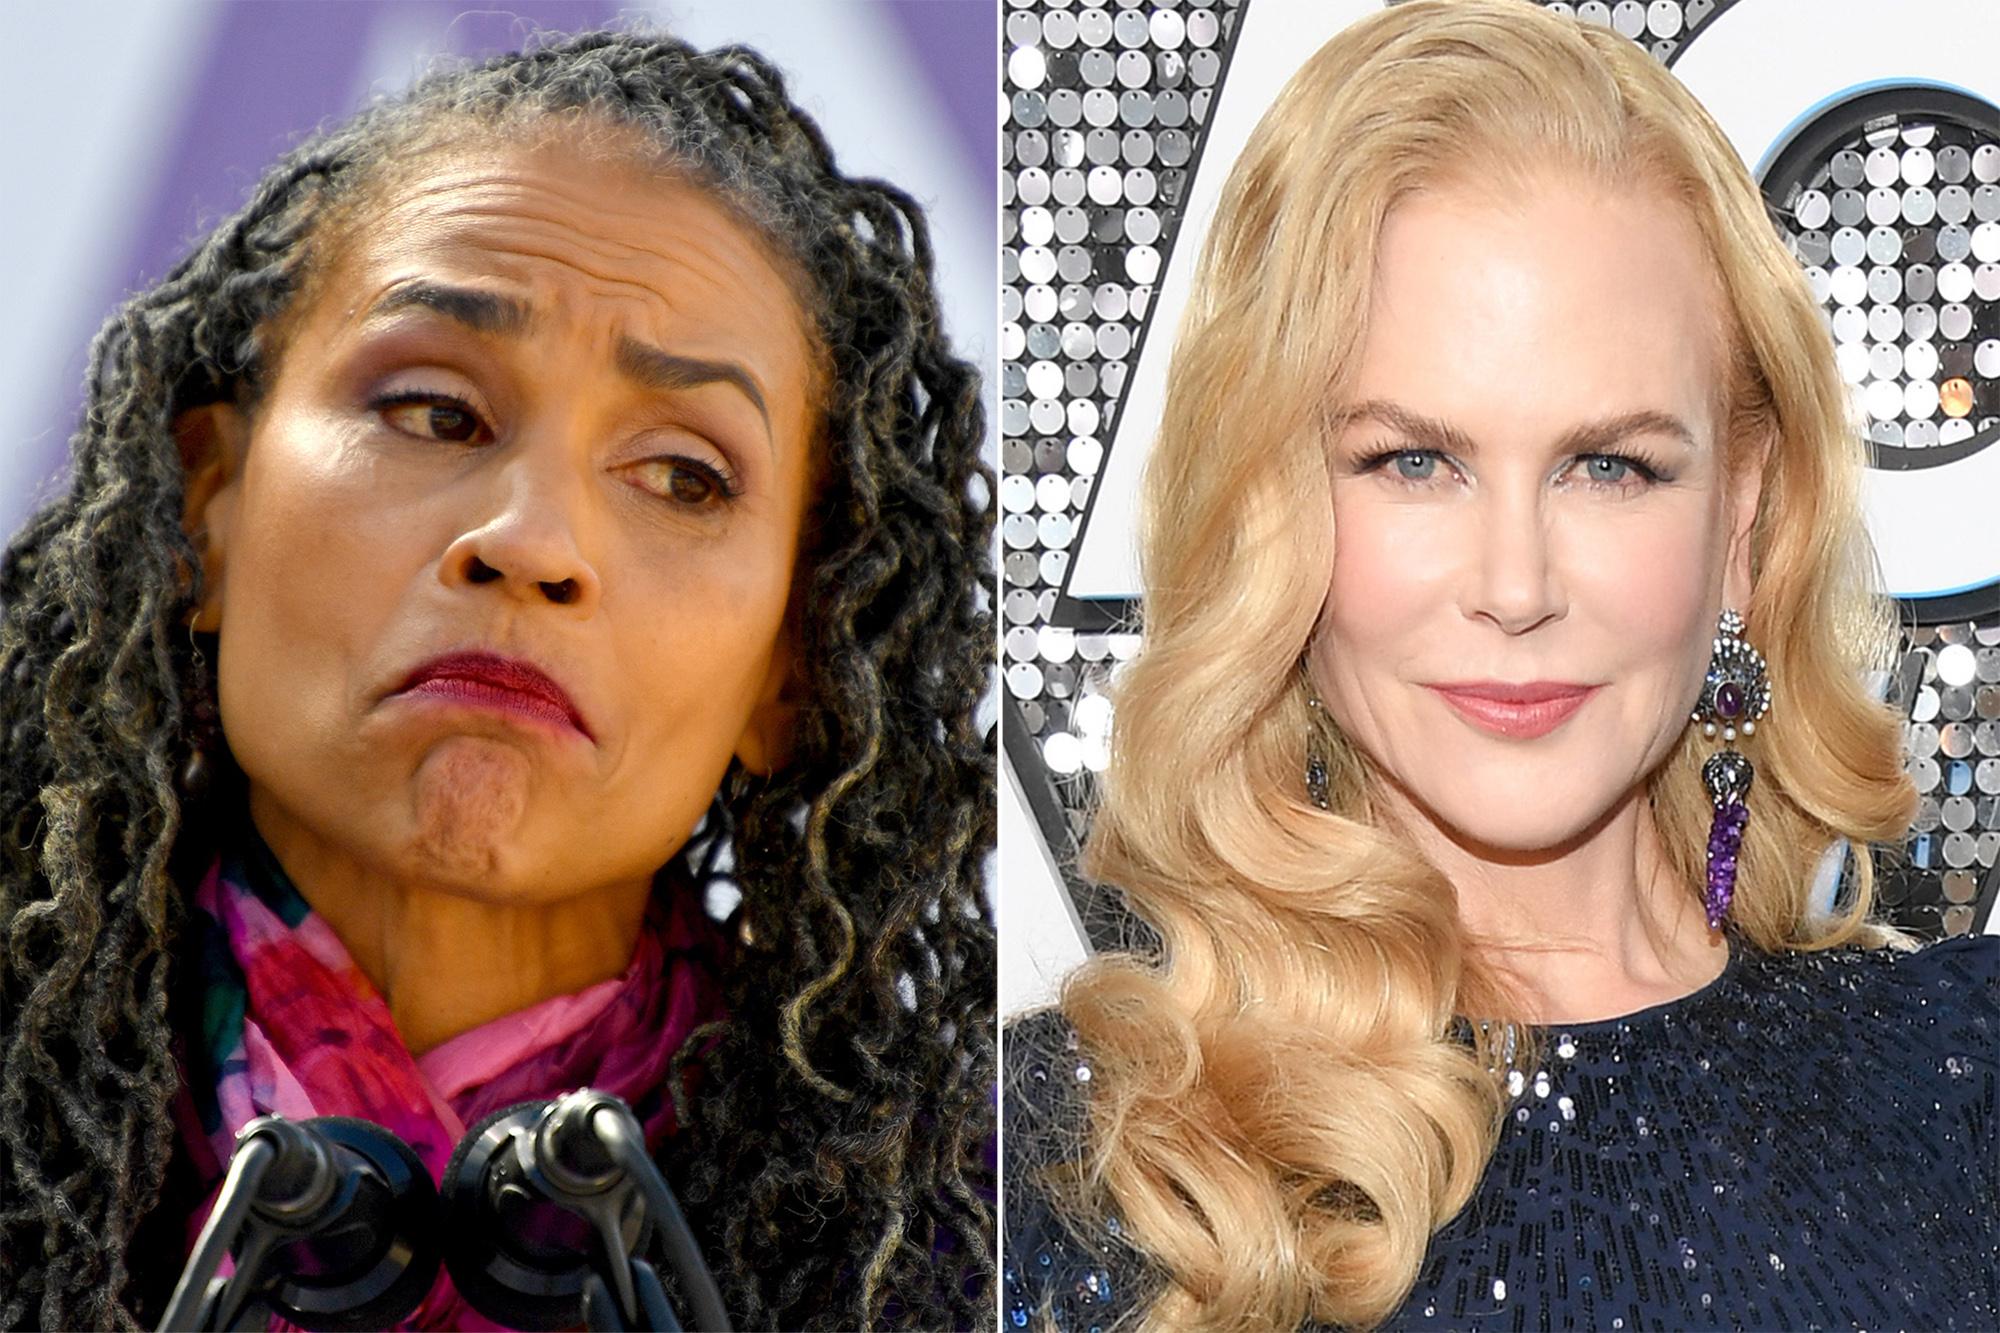 NYC mayoral hopeful Maya Wiley mistakes Nicole Kidman fan as real